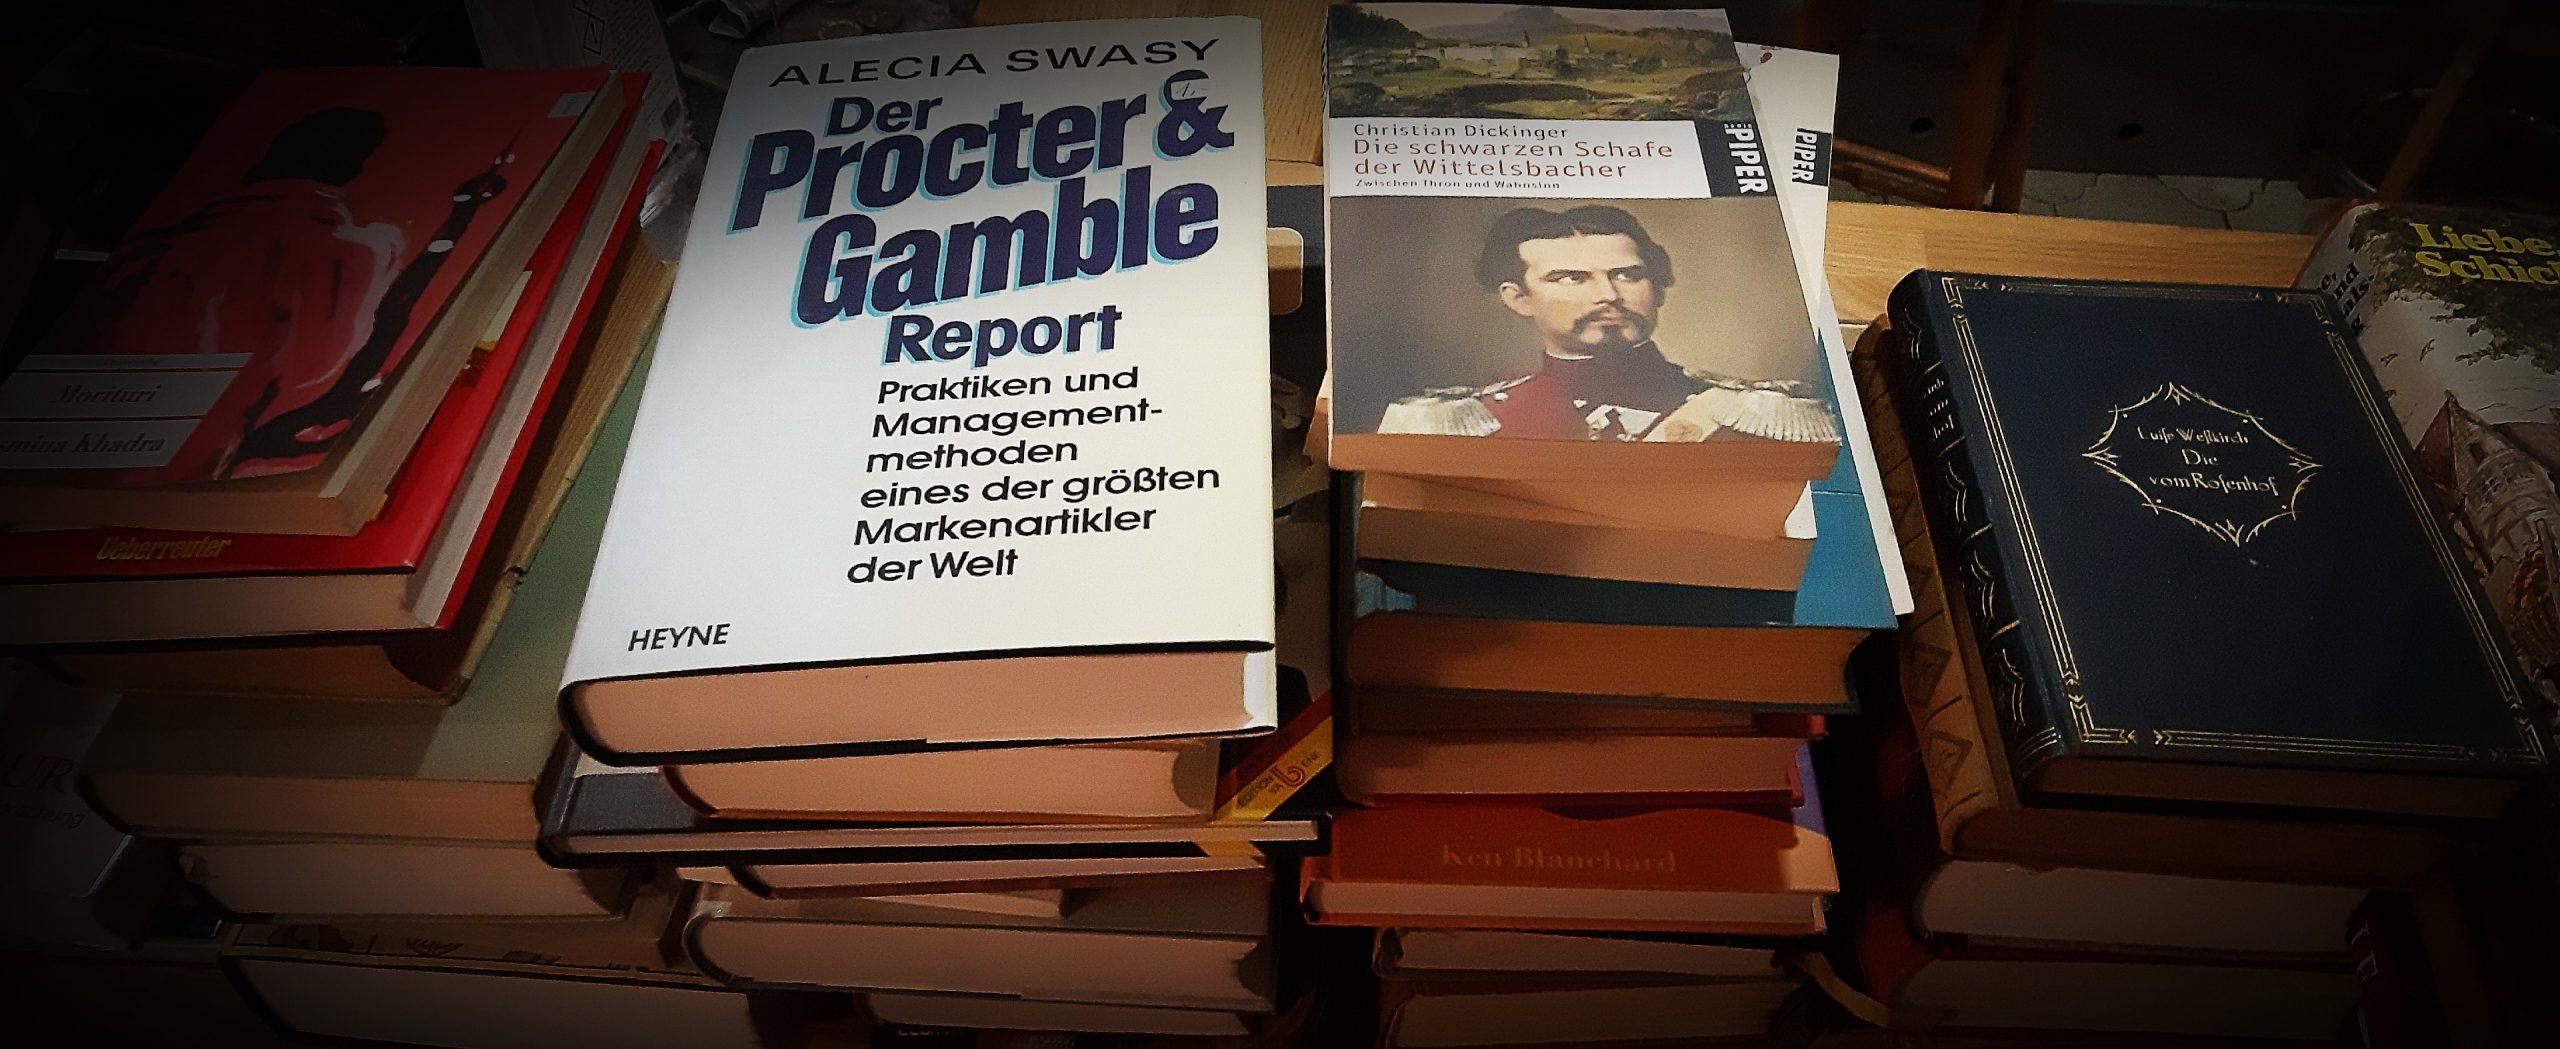 bücher neu read!!ing room 2021 januar